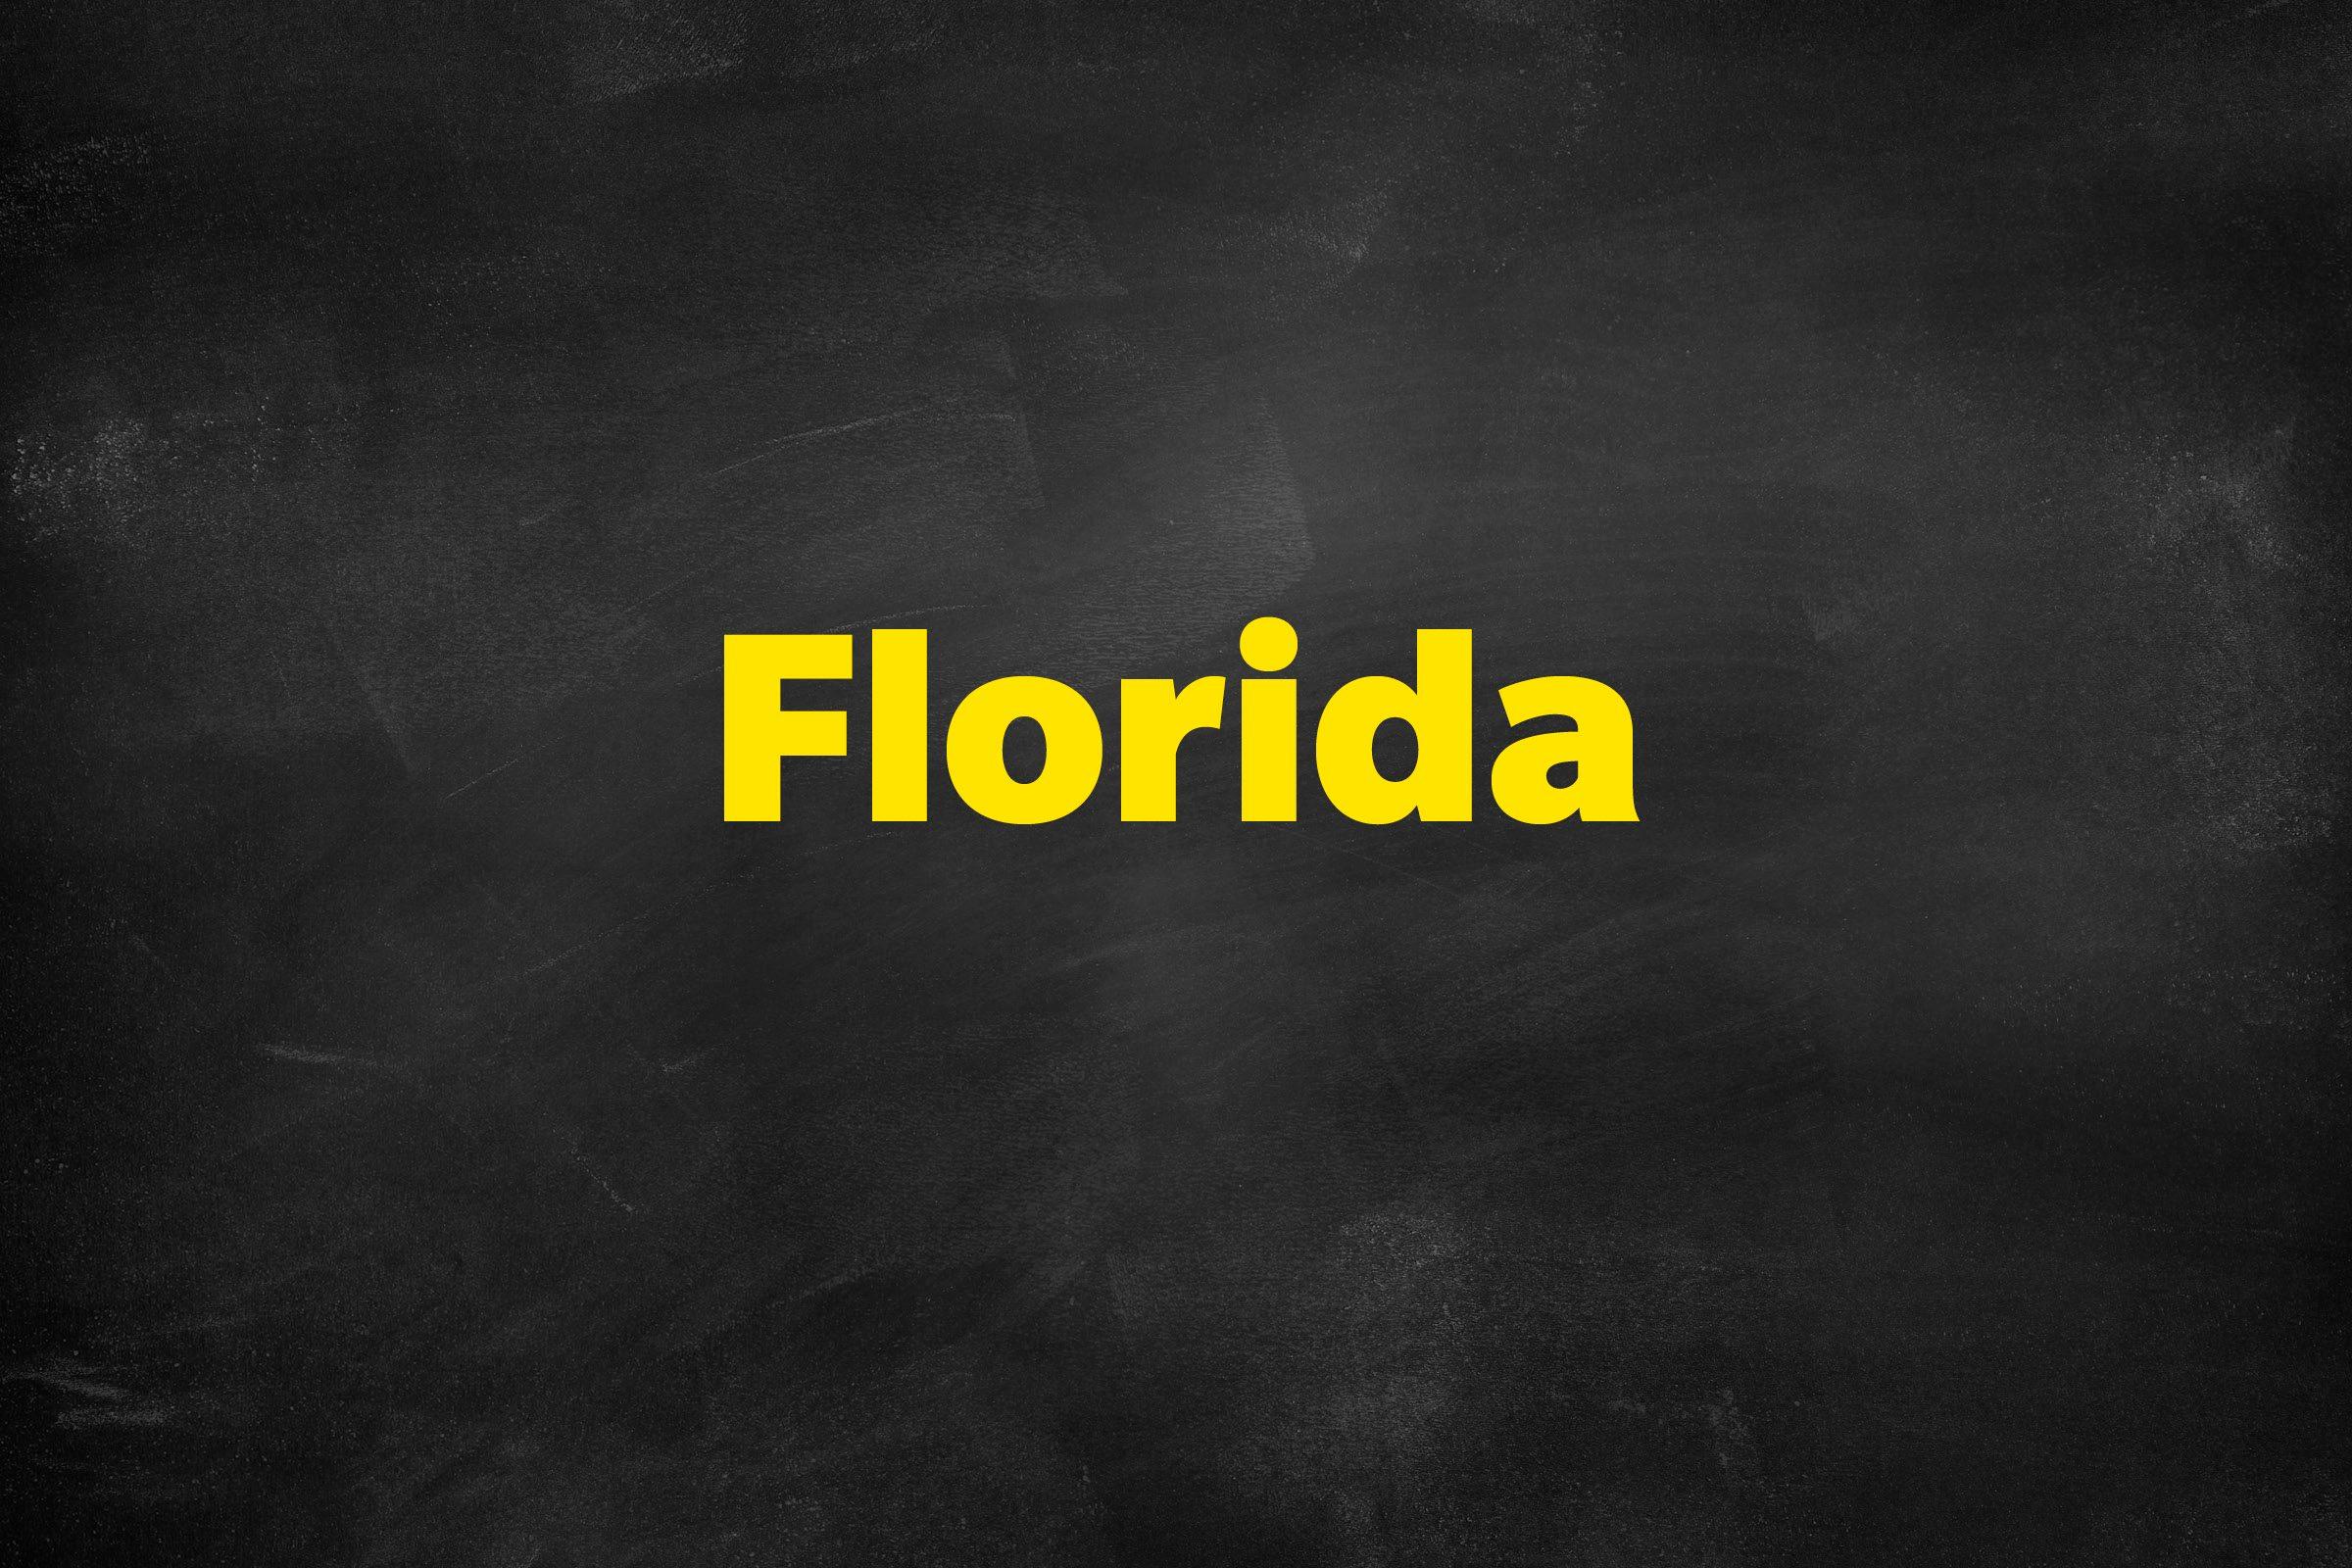 Answer: Florida